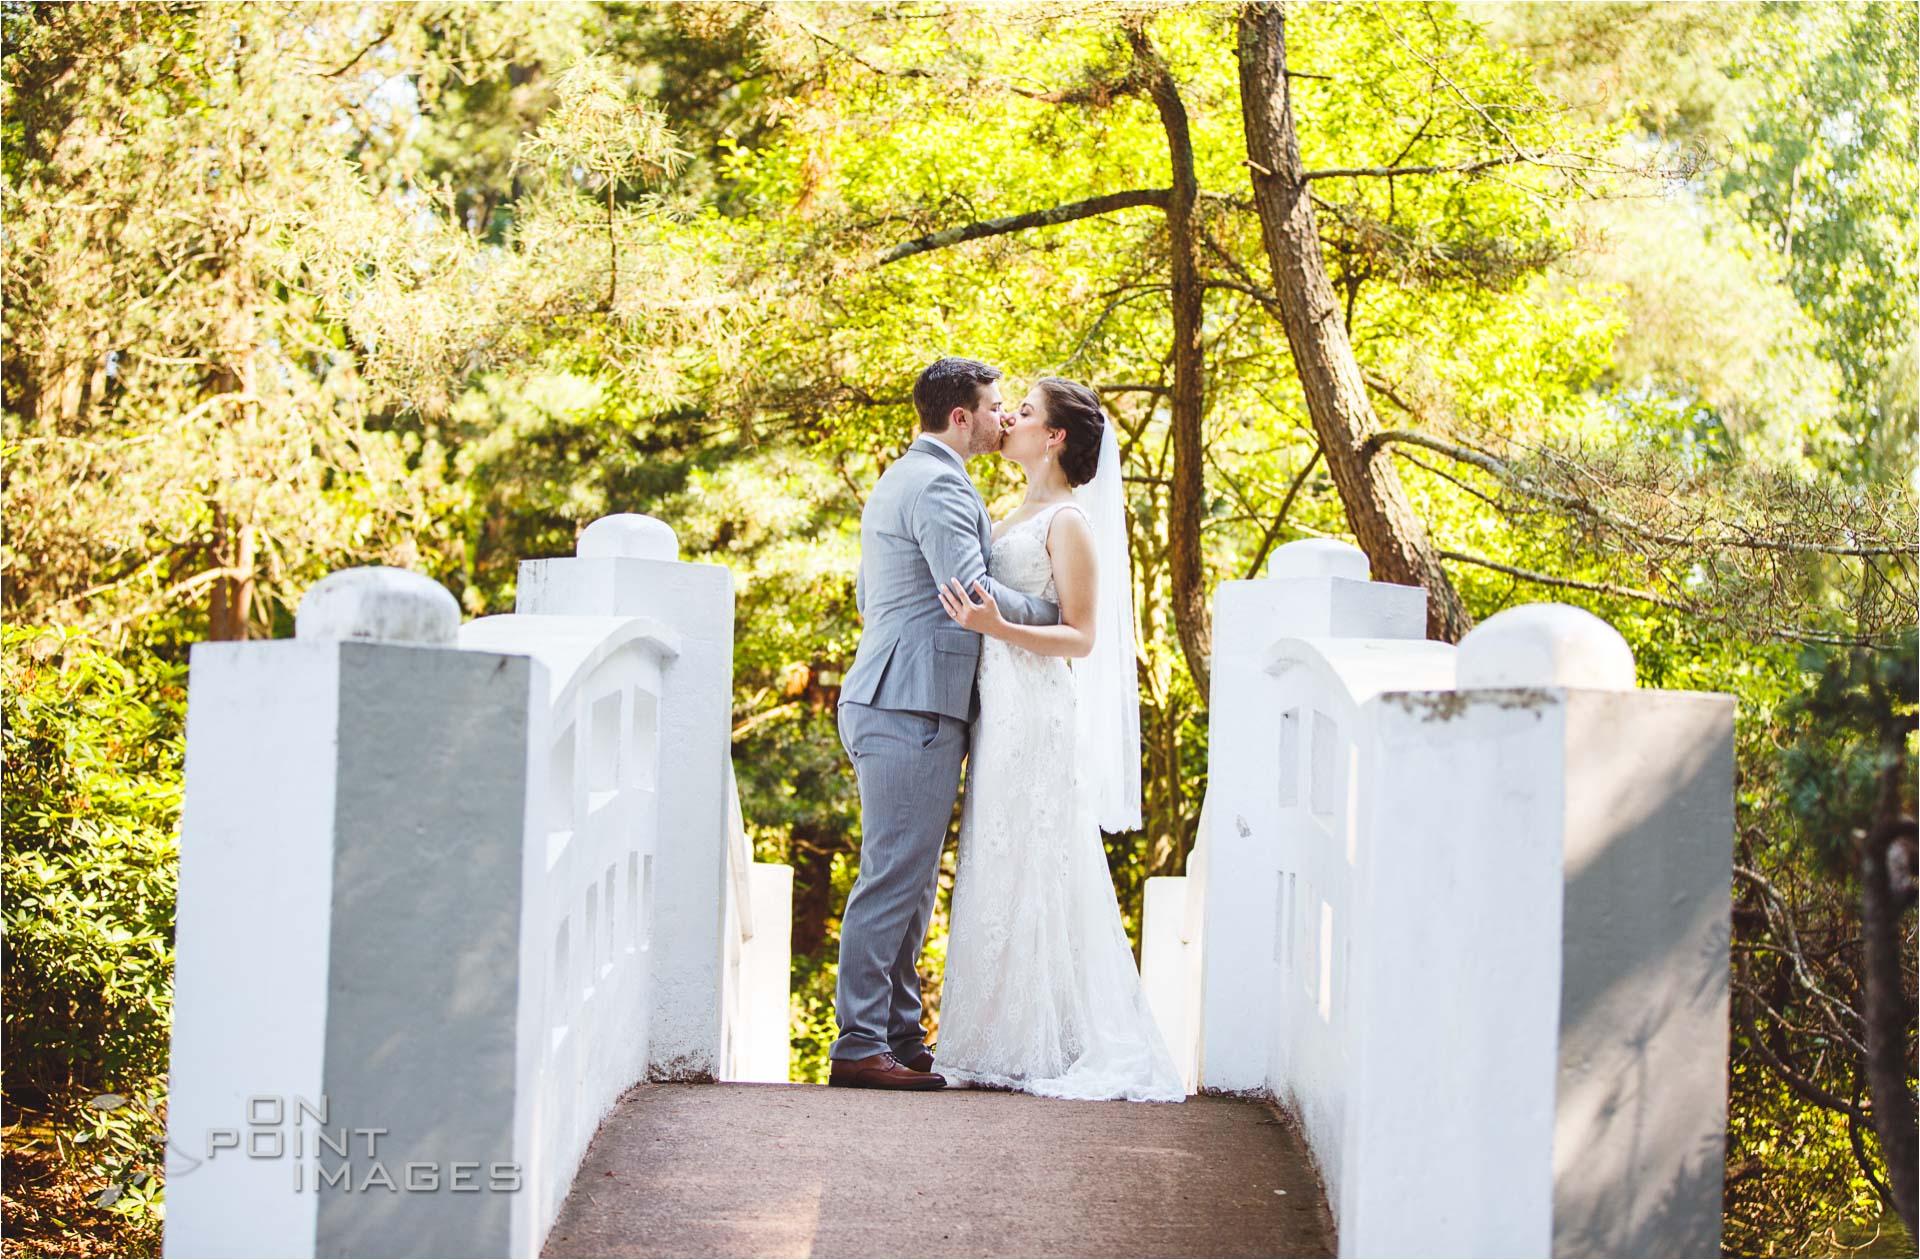 wickham-park-wedding-photographer-ct-16.jpg